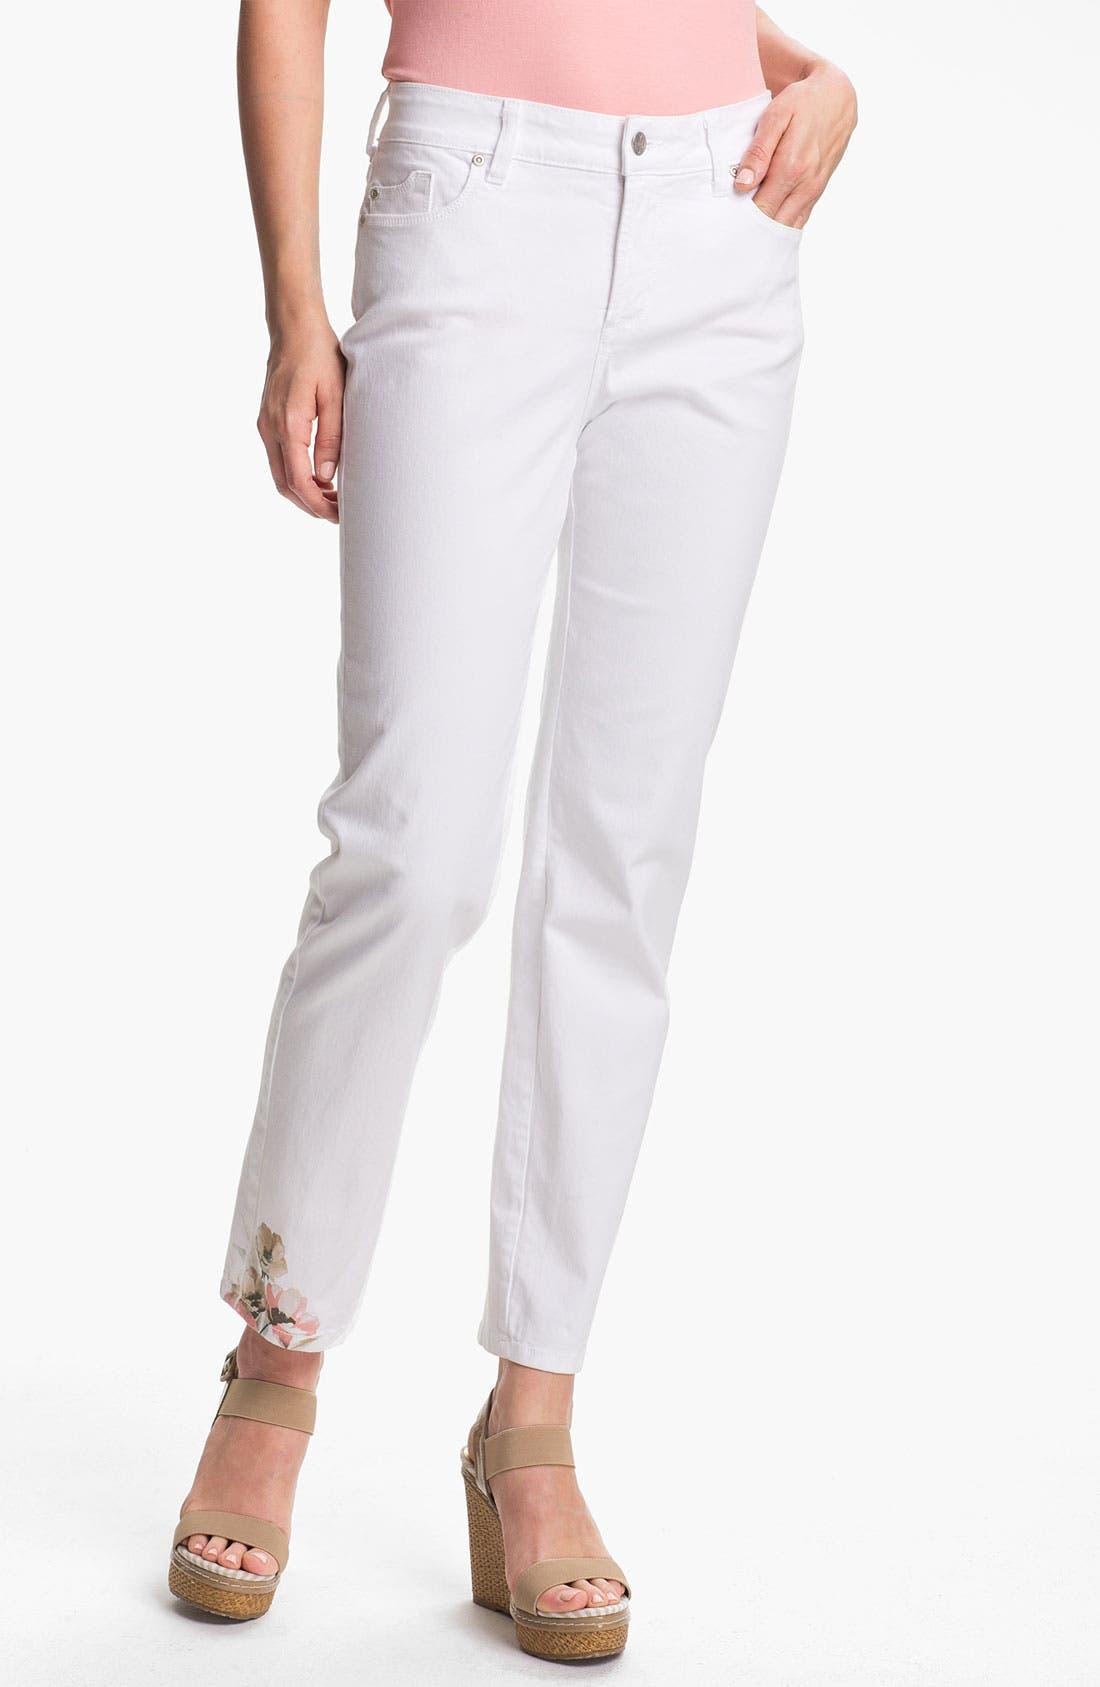 Alternate Image 1 Selected - NYDJ 'Alisha - Placed Print' Skinny Stretch Ankle Jeans